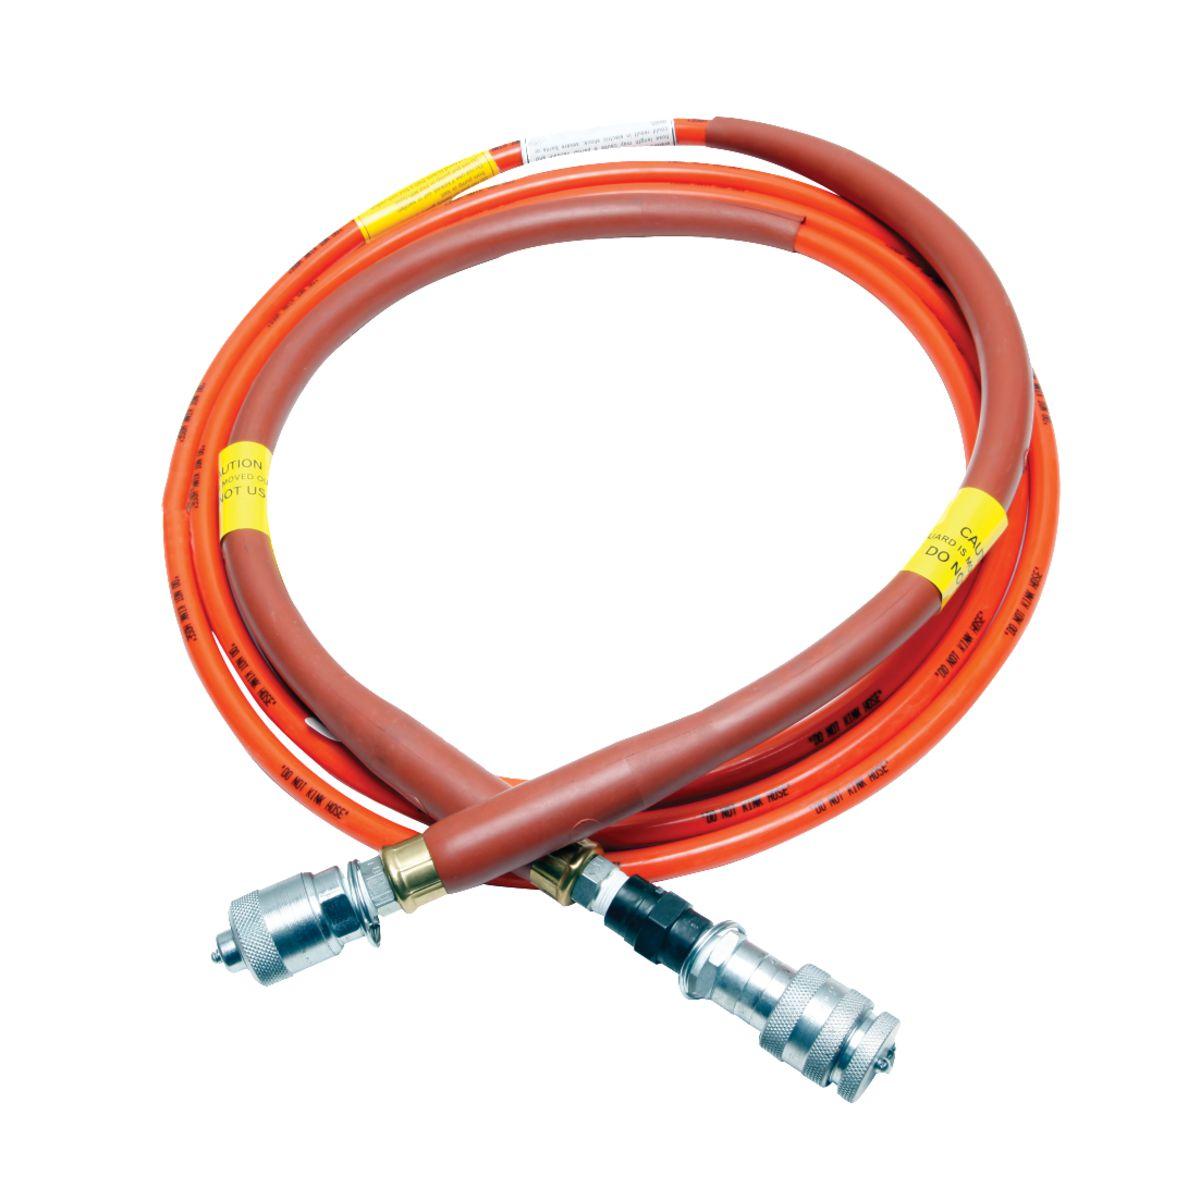 "Burndy PT29900-10 Non-Conductive Hydraulic Pump Hose, 3/16"" x 10ft"